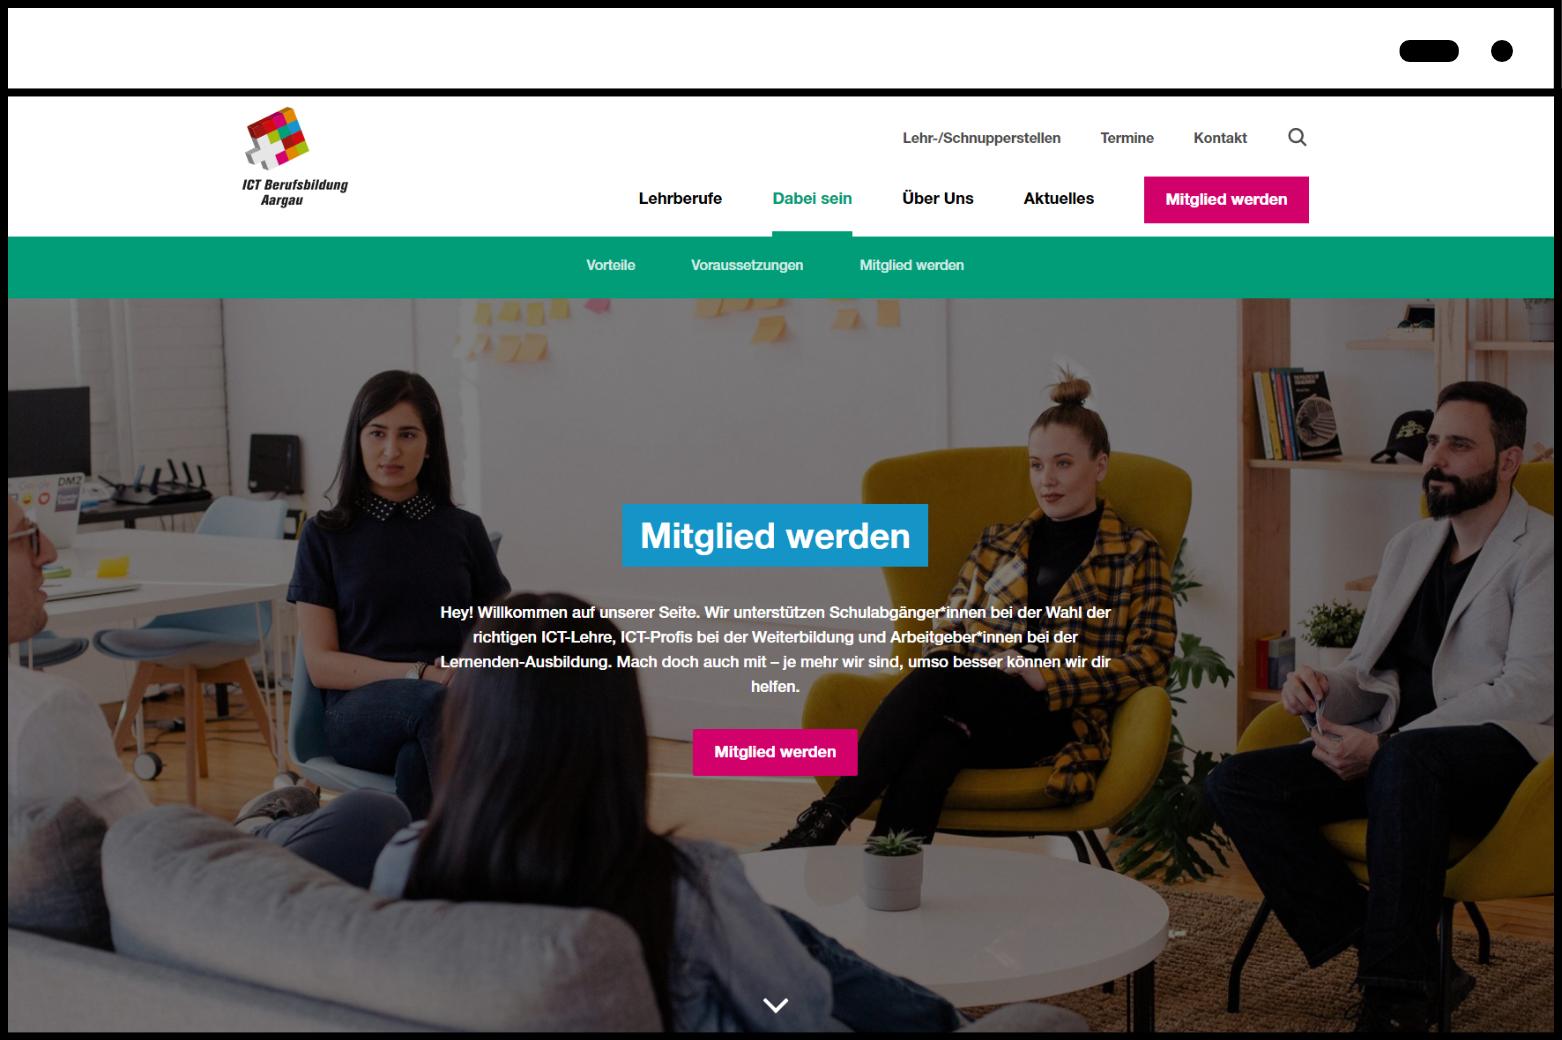 ICT Berufsbildung Aargau